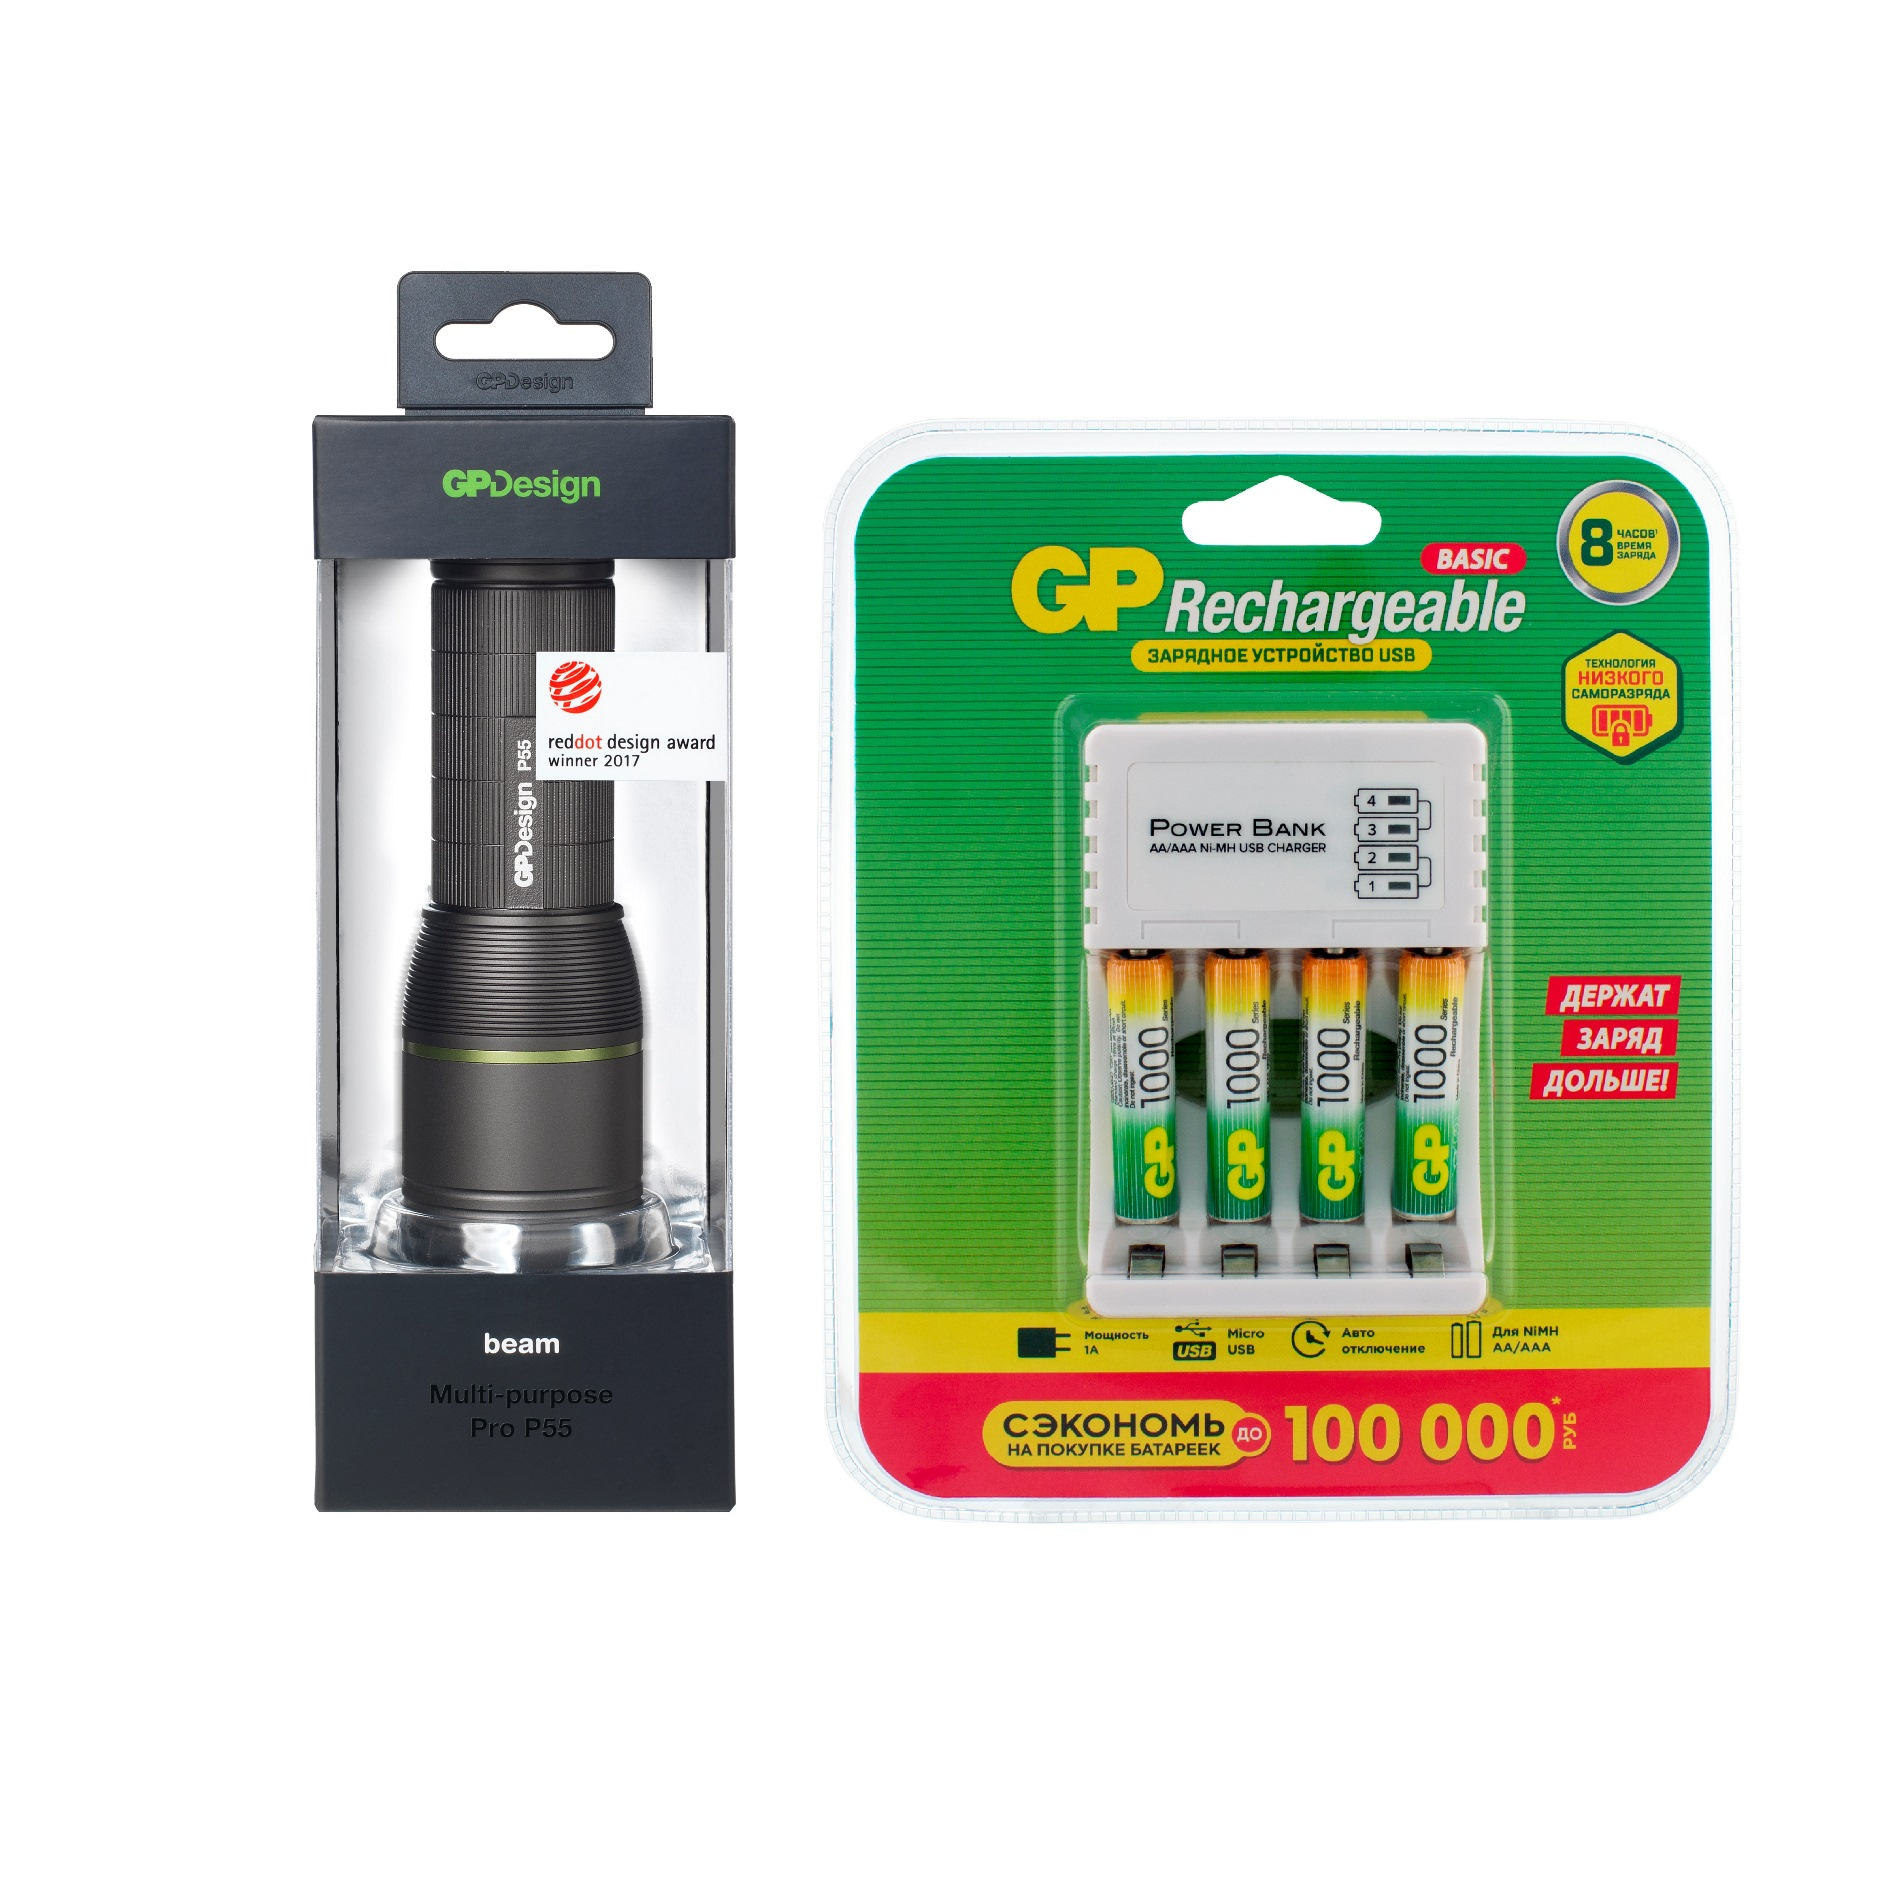 Туристический фонарь GP P55NX00001SD1 + 100AAAHC/CPB-2CR4 холодный, серый, 9 режимов